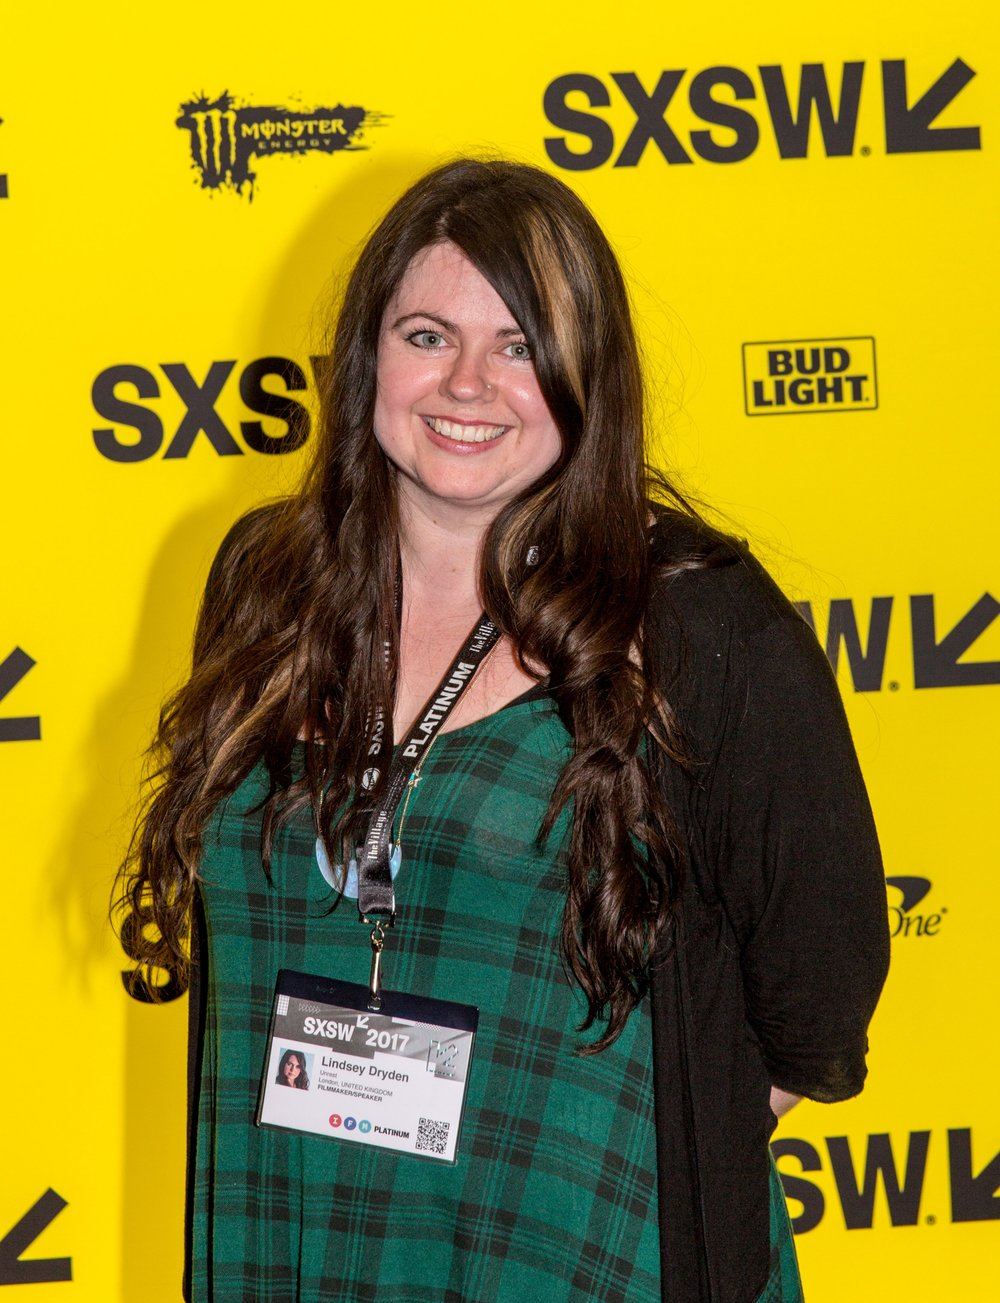 Lindsey SXSW 2017.jpg